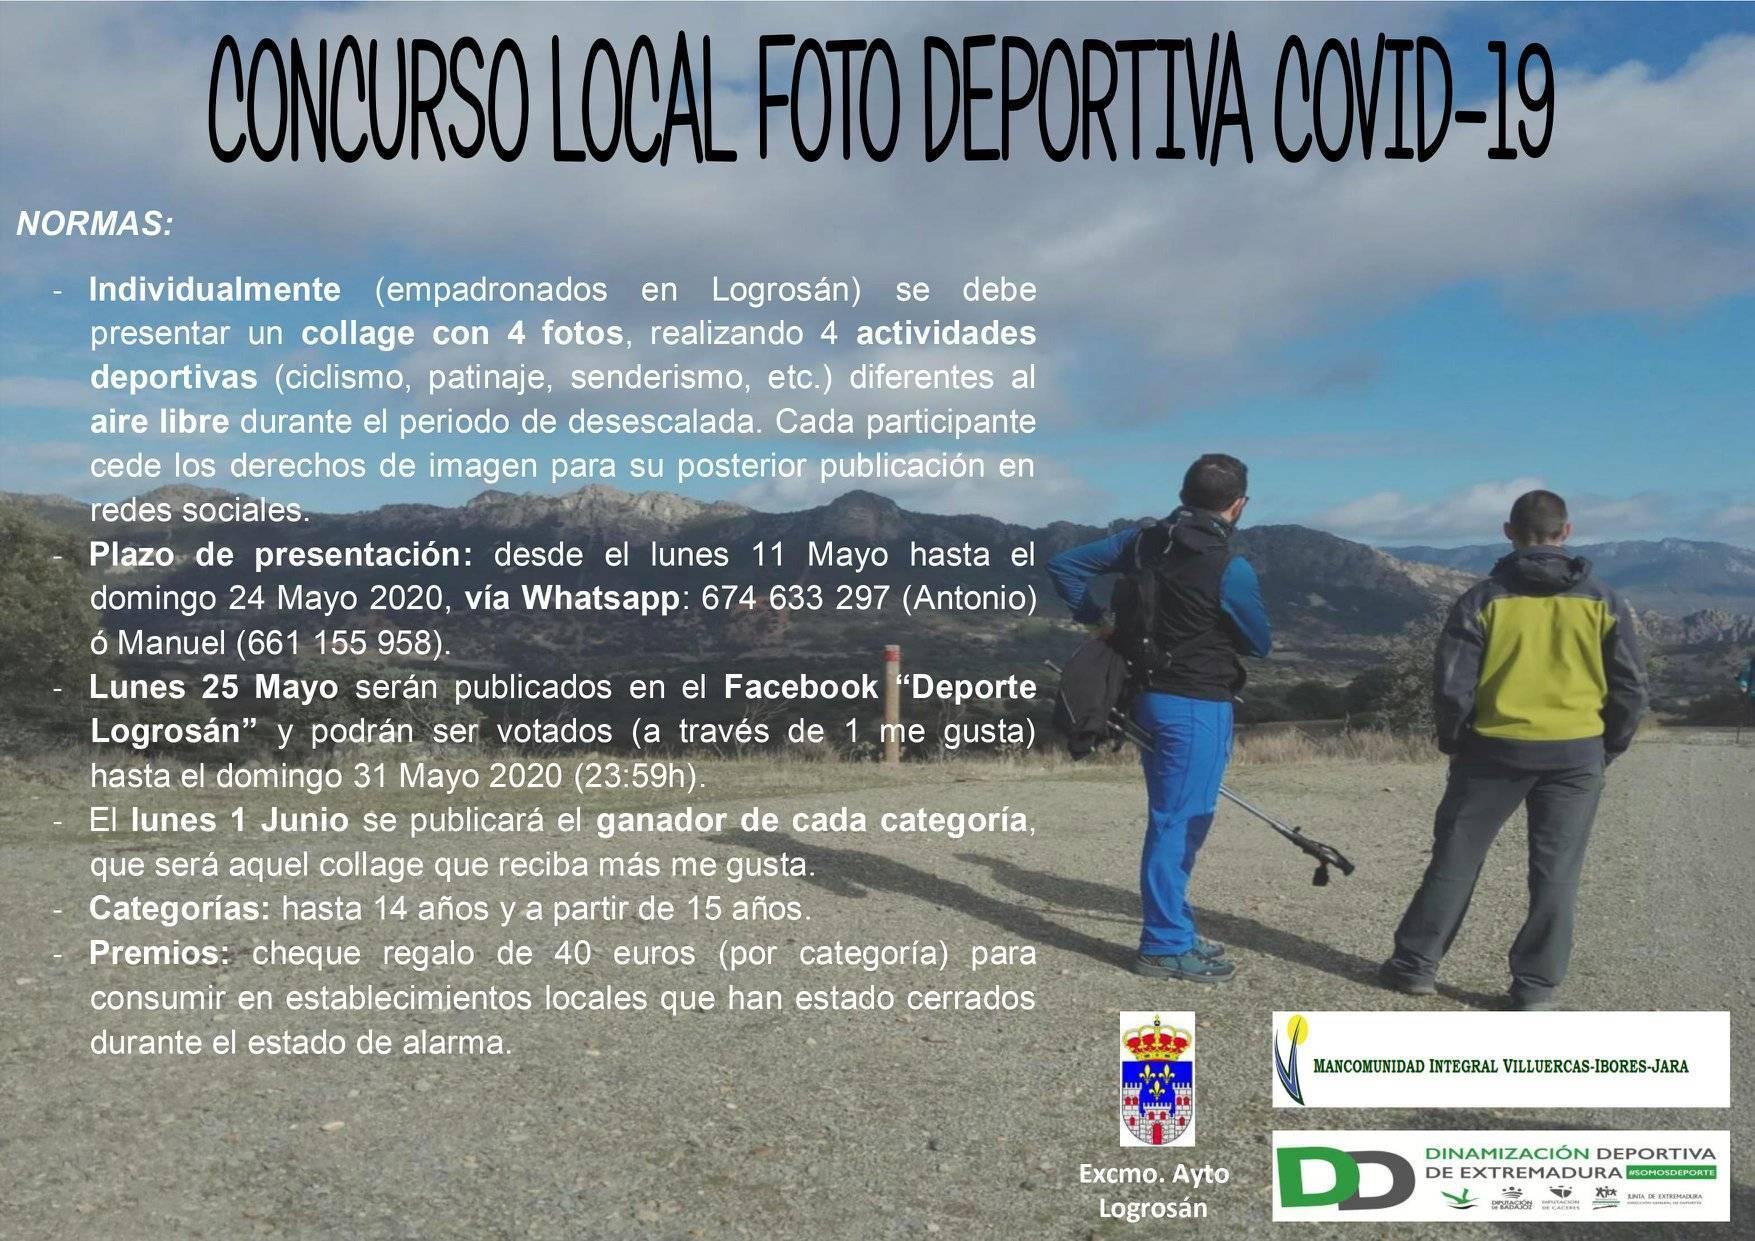 Concurso local de foto deportiva COVID-19 2020 - Logrosán (Cáceres)